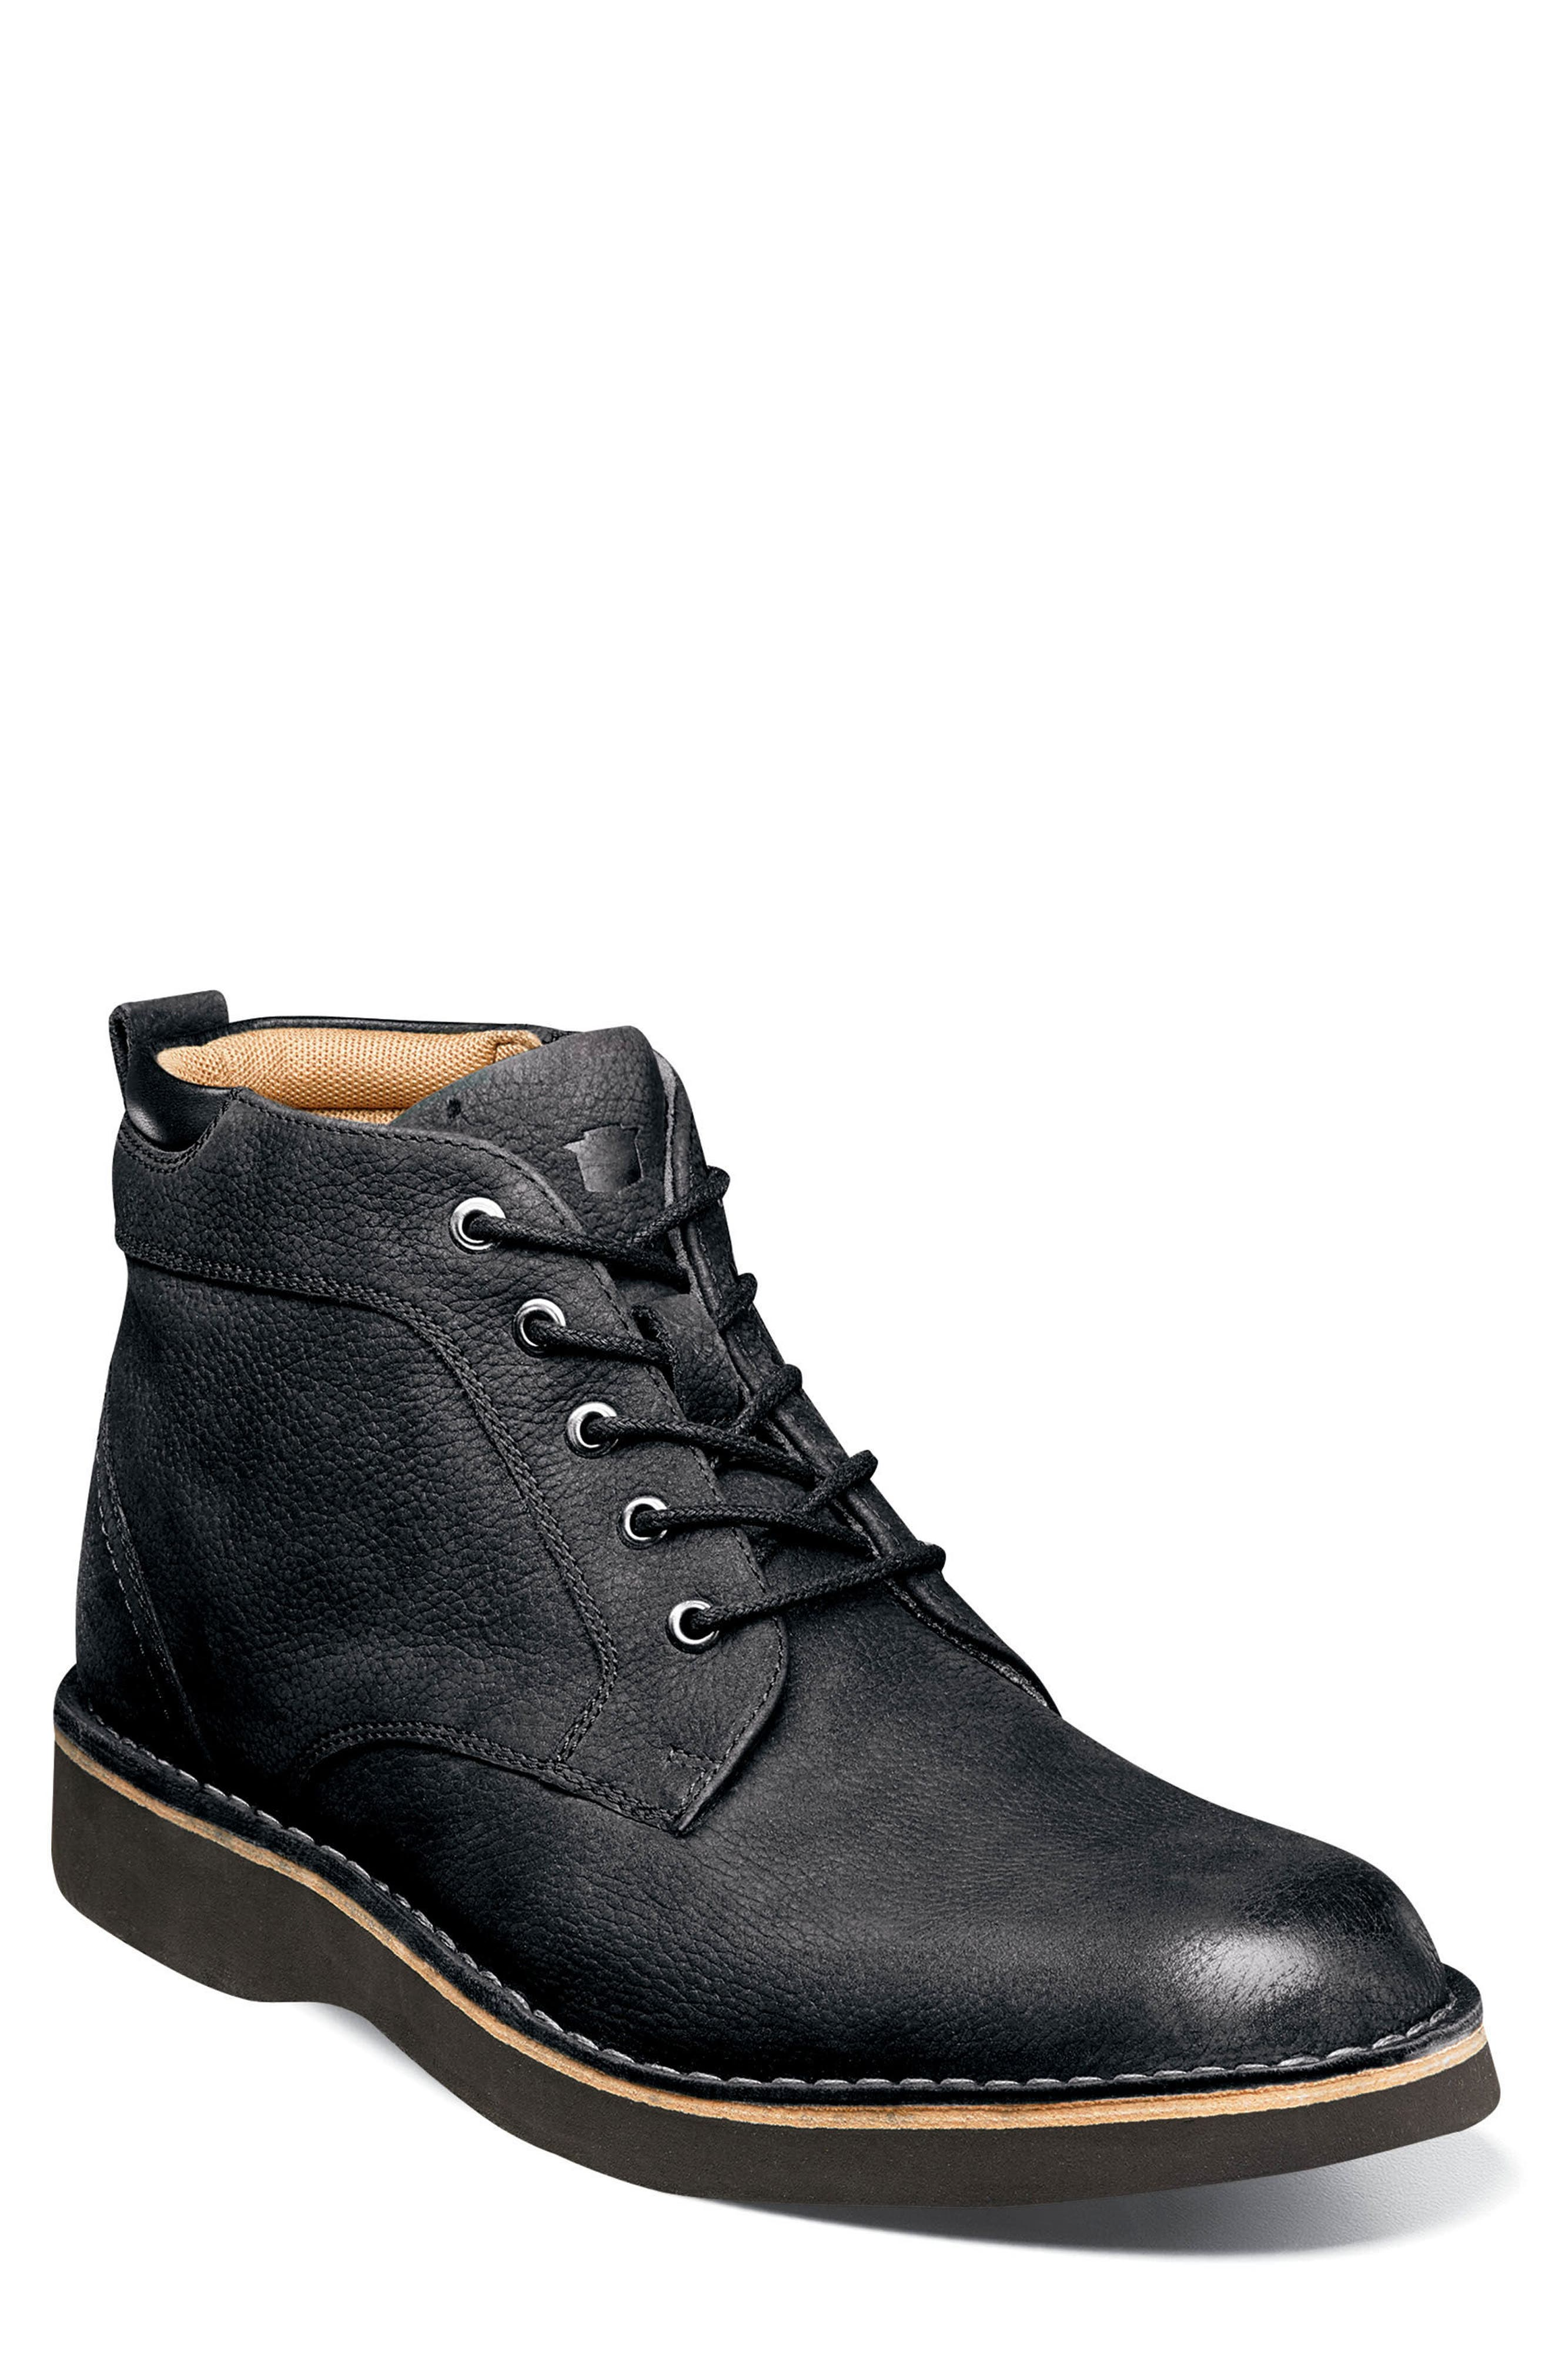 Navigator Plain Toe Boot,                         Main,                         color, 006